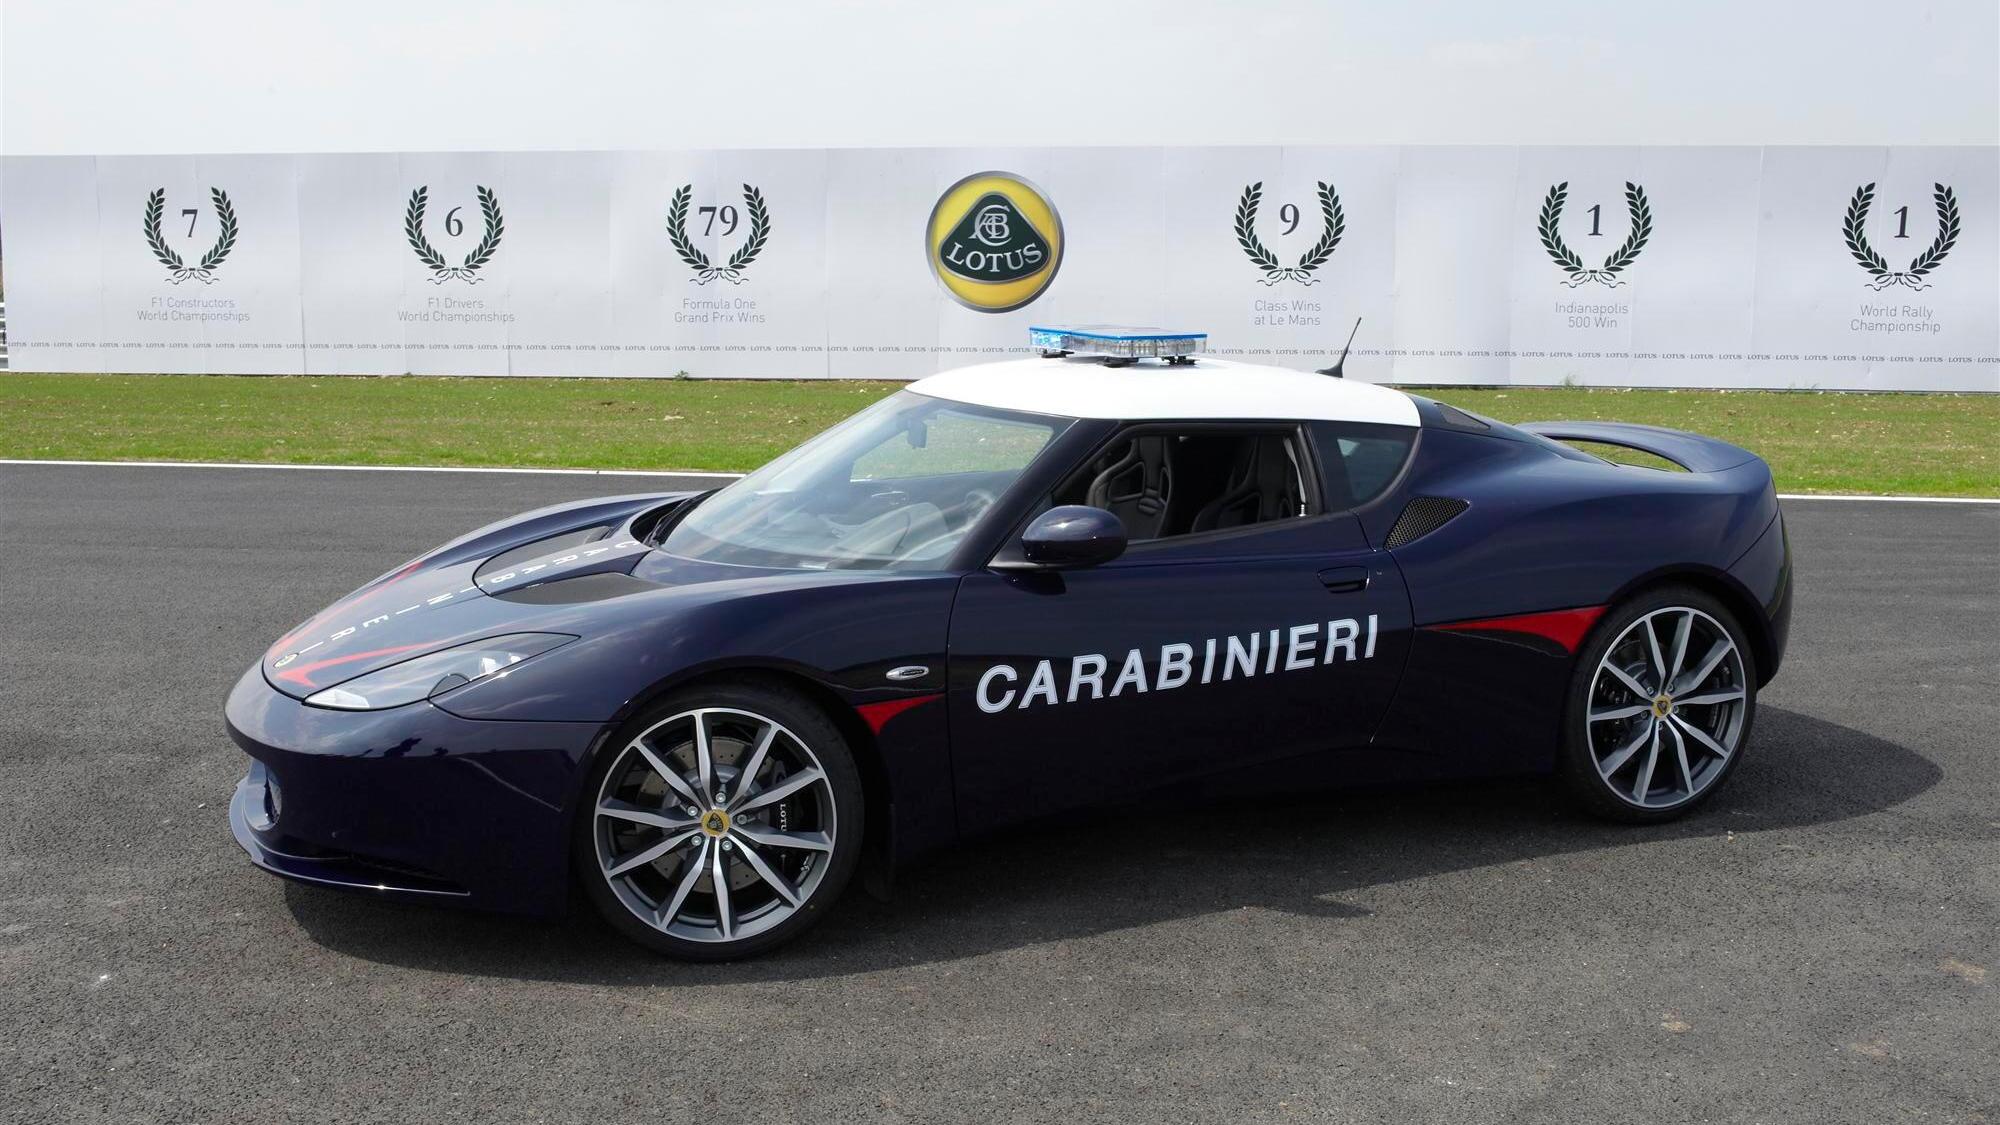 Lotus Evora S enters service with Italian Carabinieri